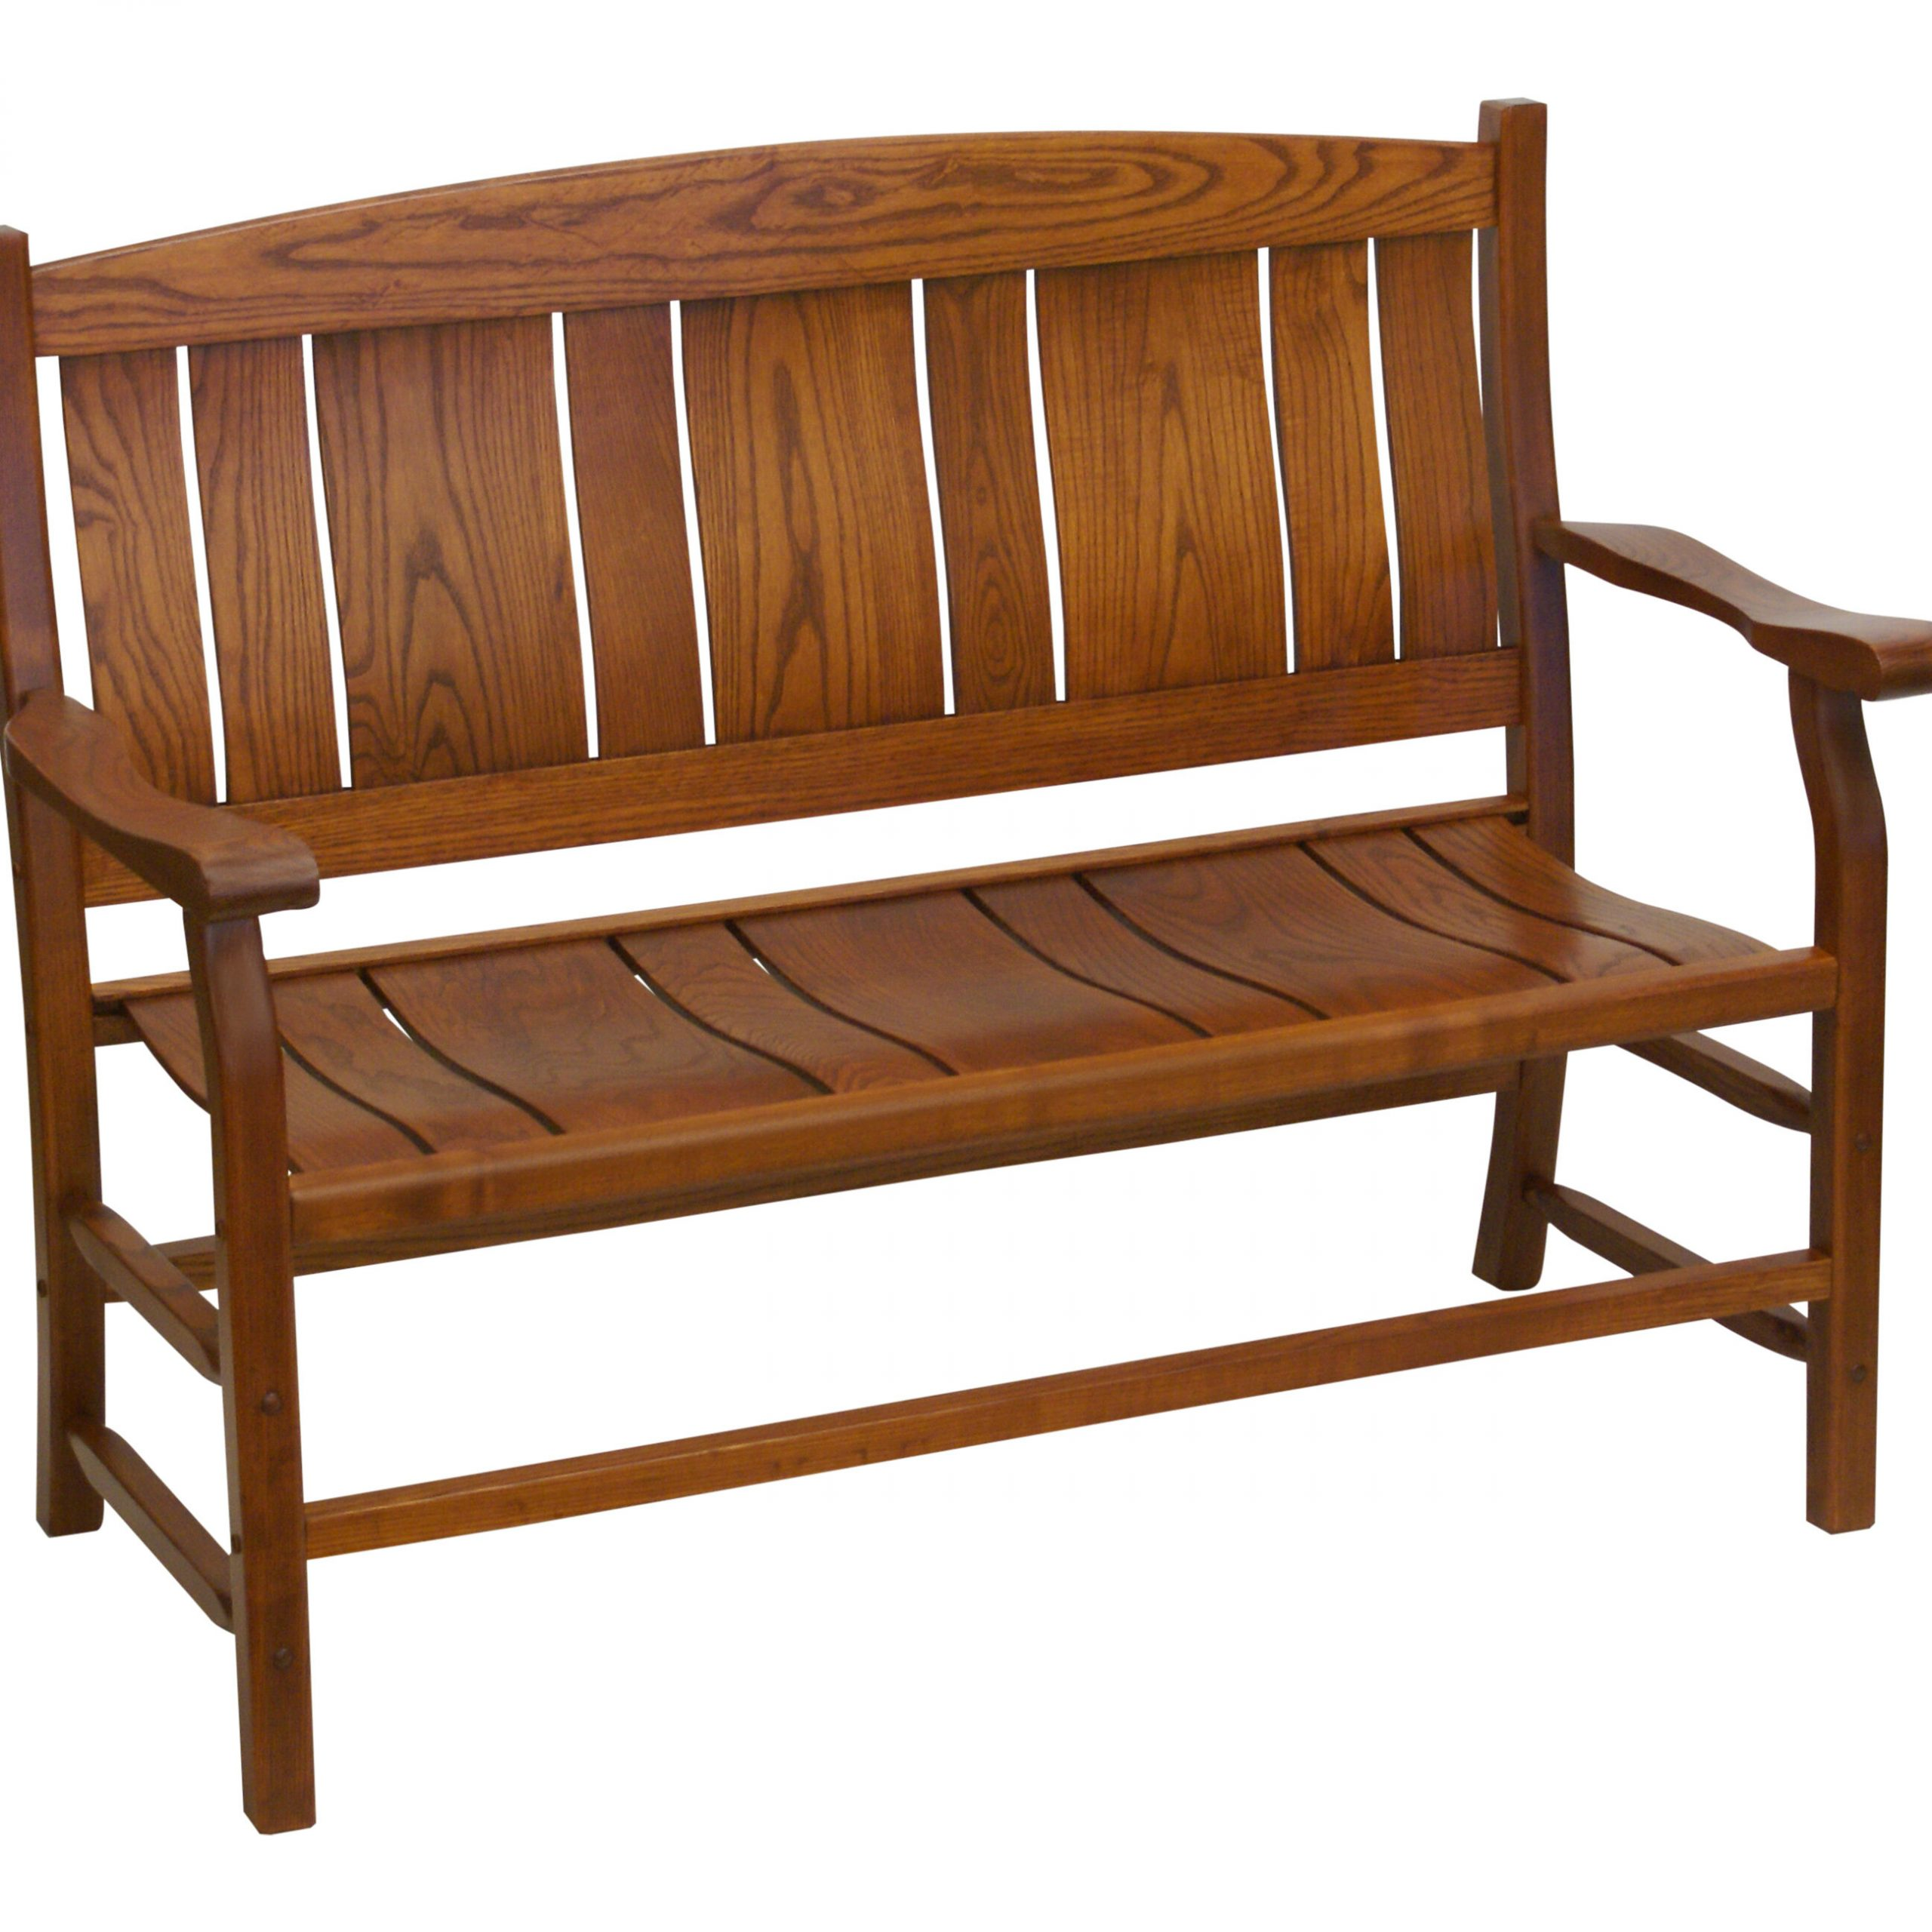 Grindle Slat Back Wooden Garden Bench Inside Leora Wooden Garden Benches (View 20 of 25)